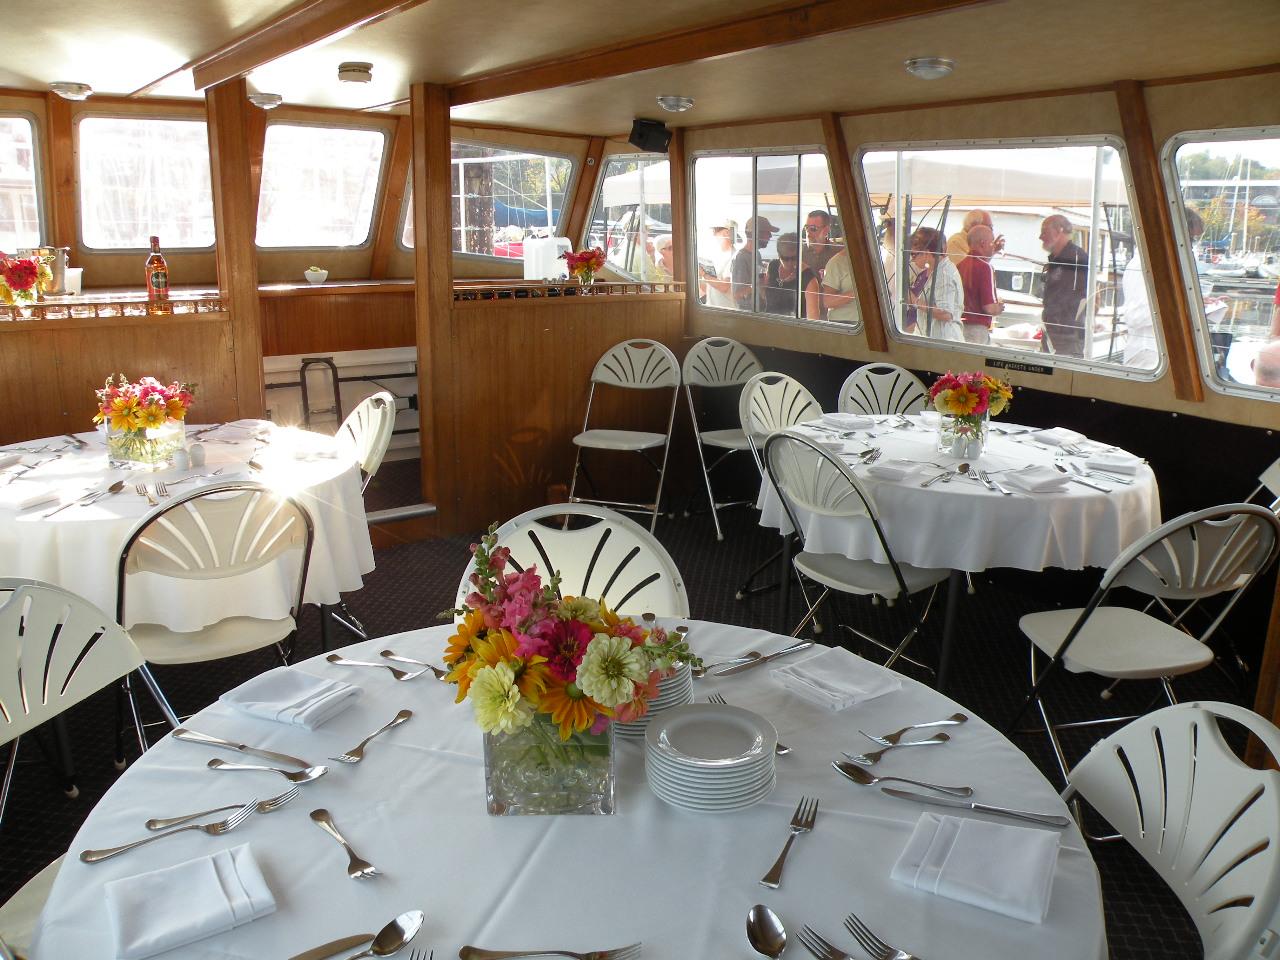 Tables set for dinner on boat